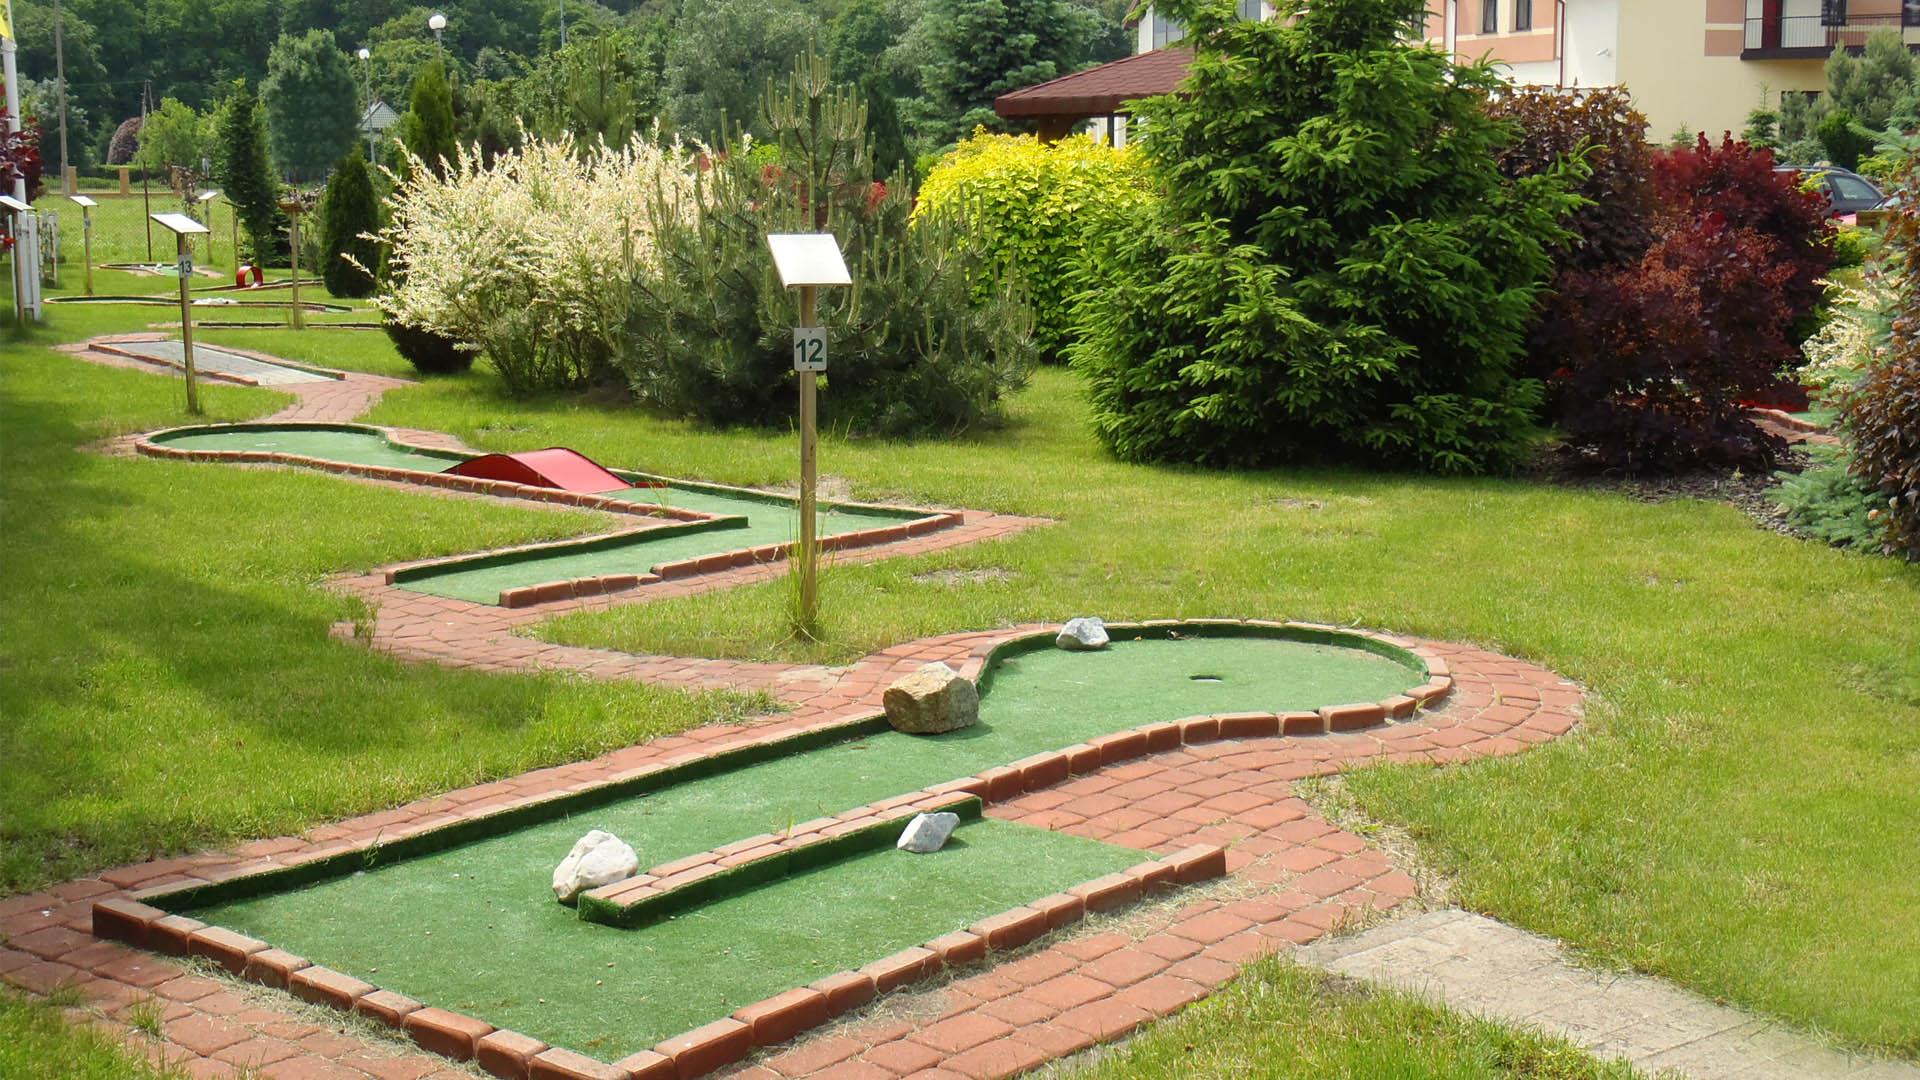 Pole do gry w mini golfa